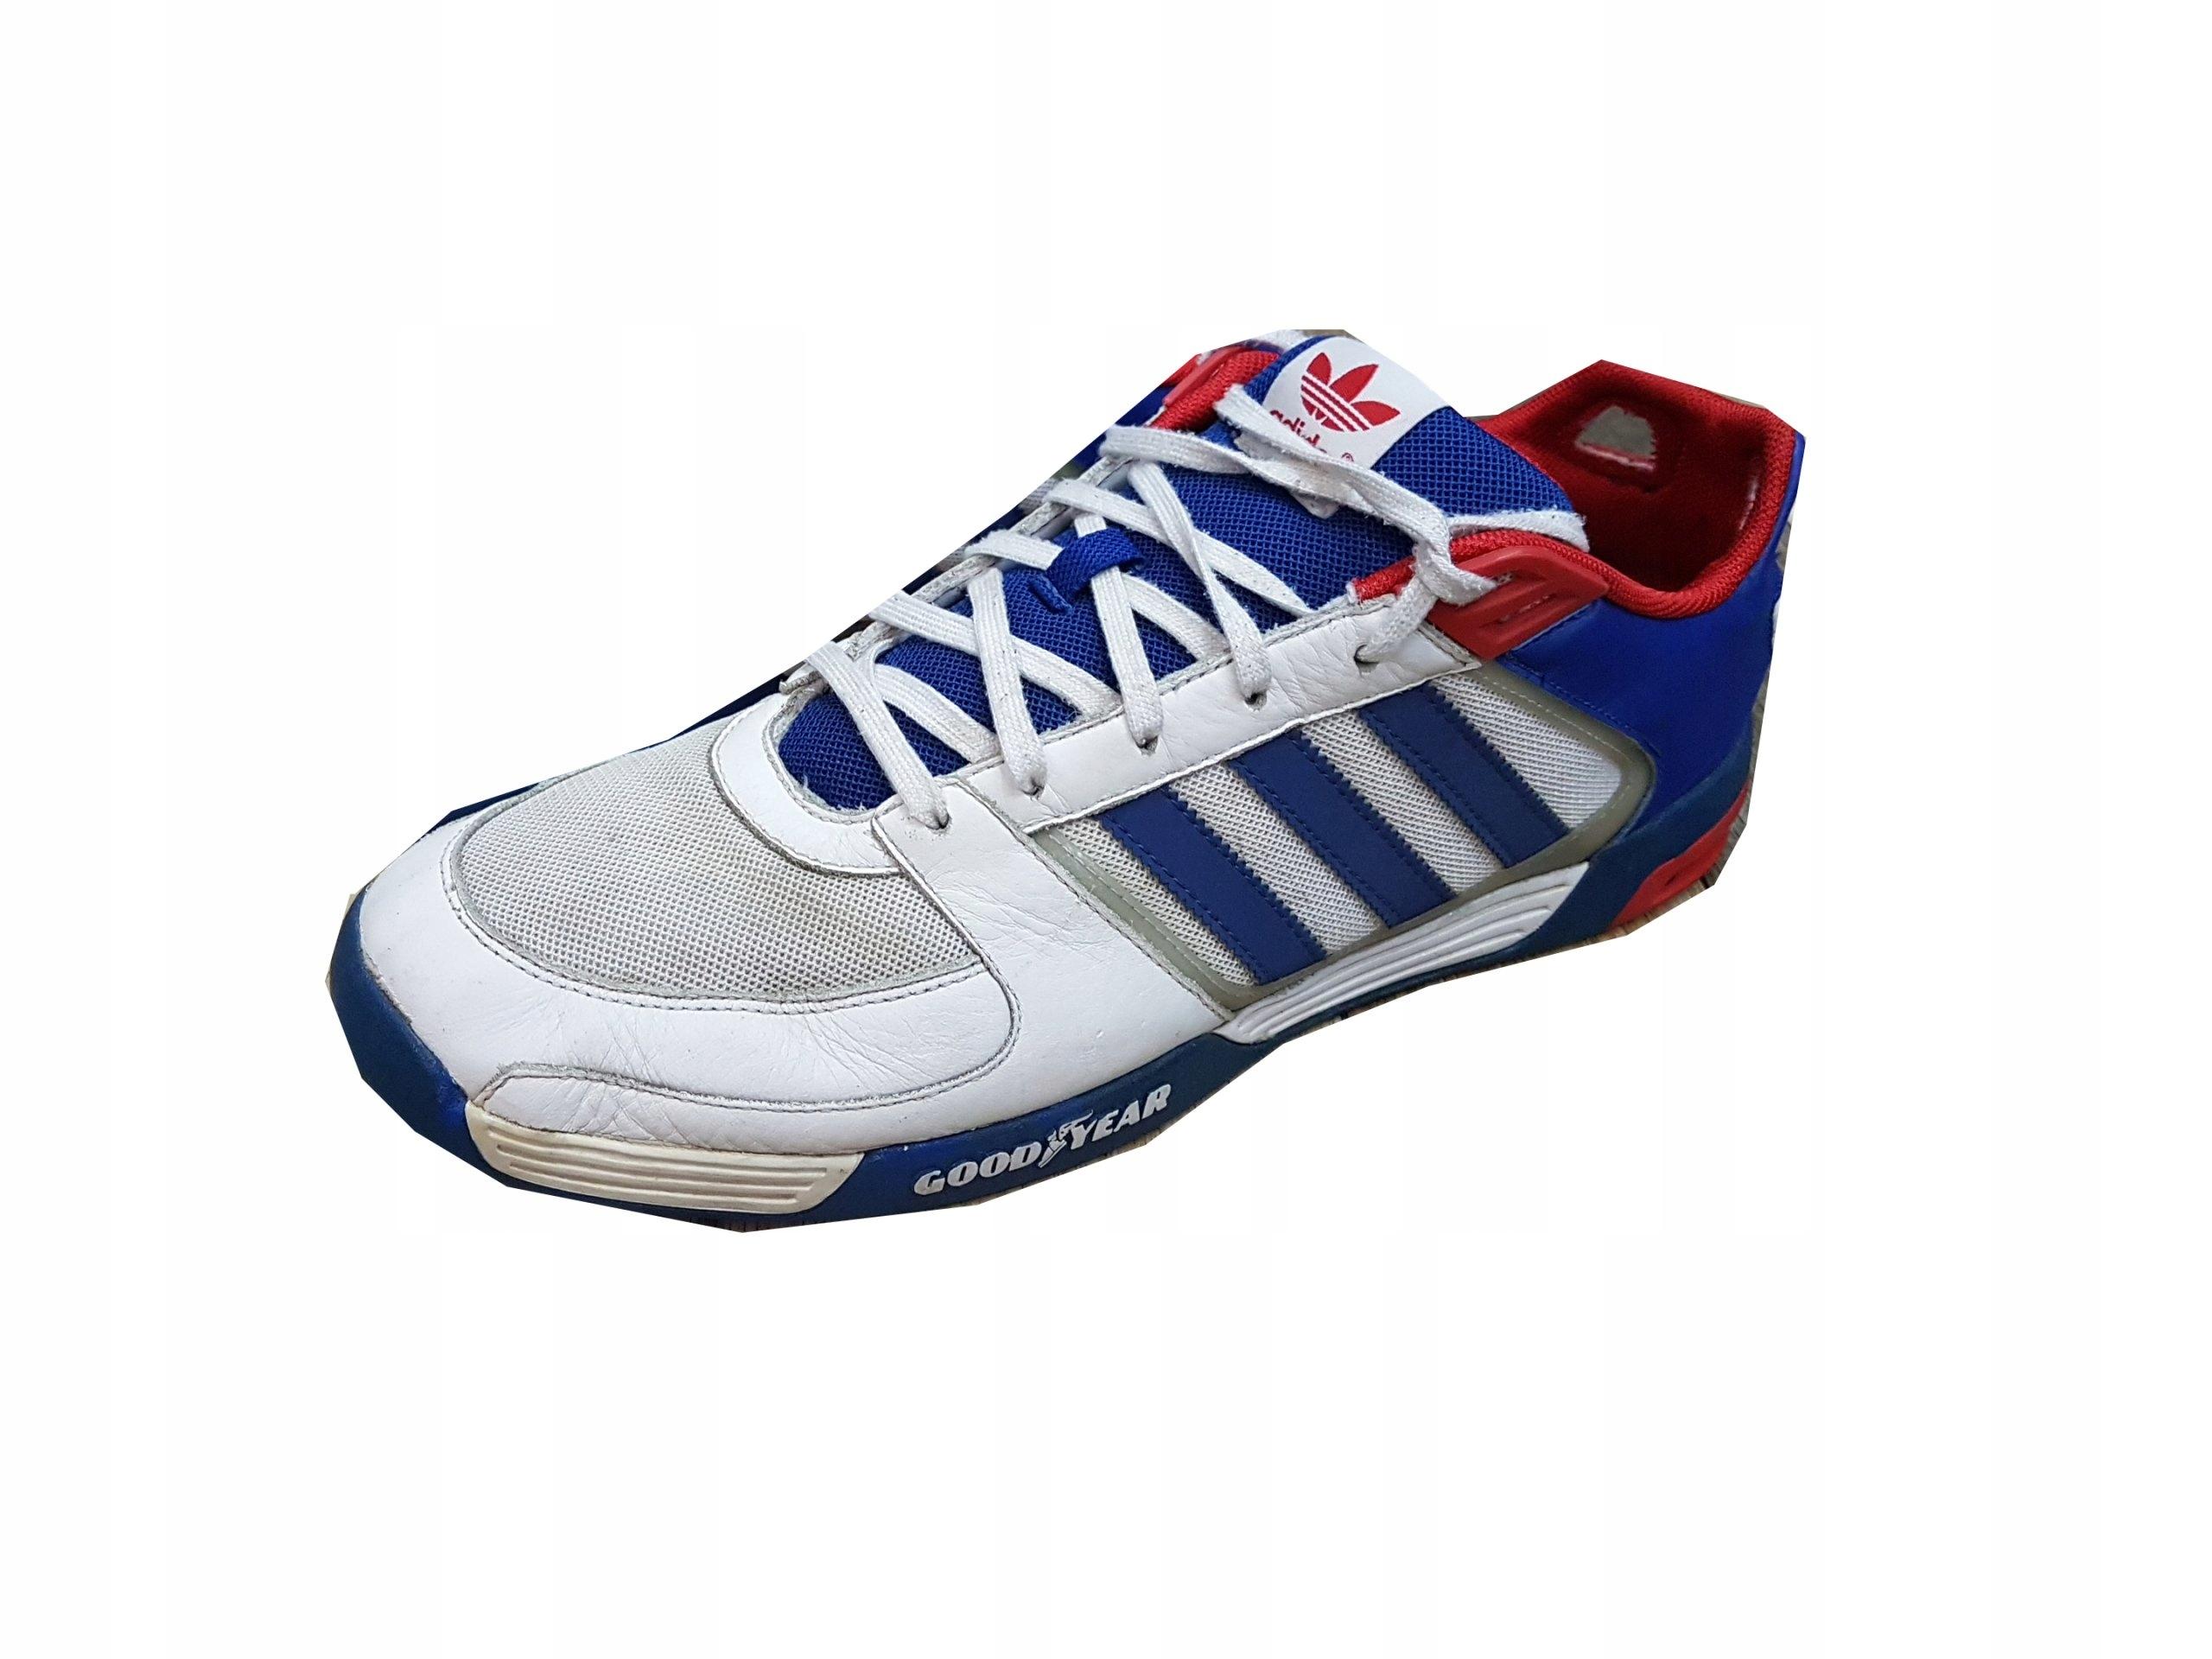 0735b20e3e56f ADIDAS GoodYear Stylowe buty męskie 47 1/3 29cm - 7424245863 ...